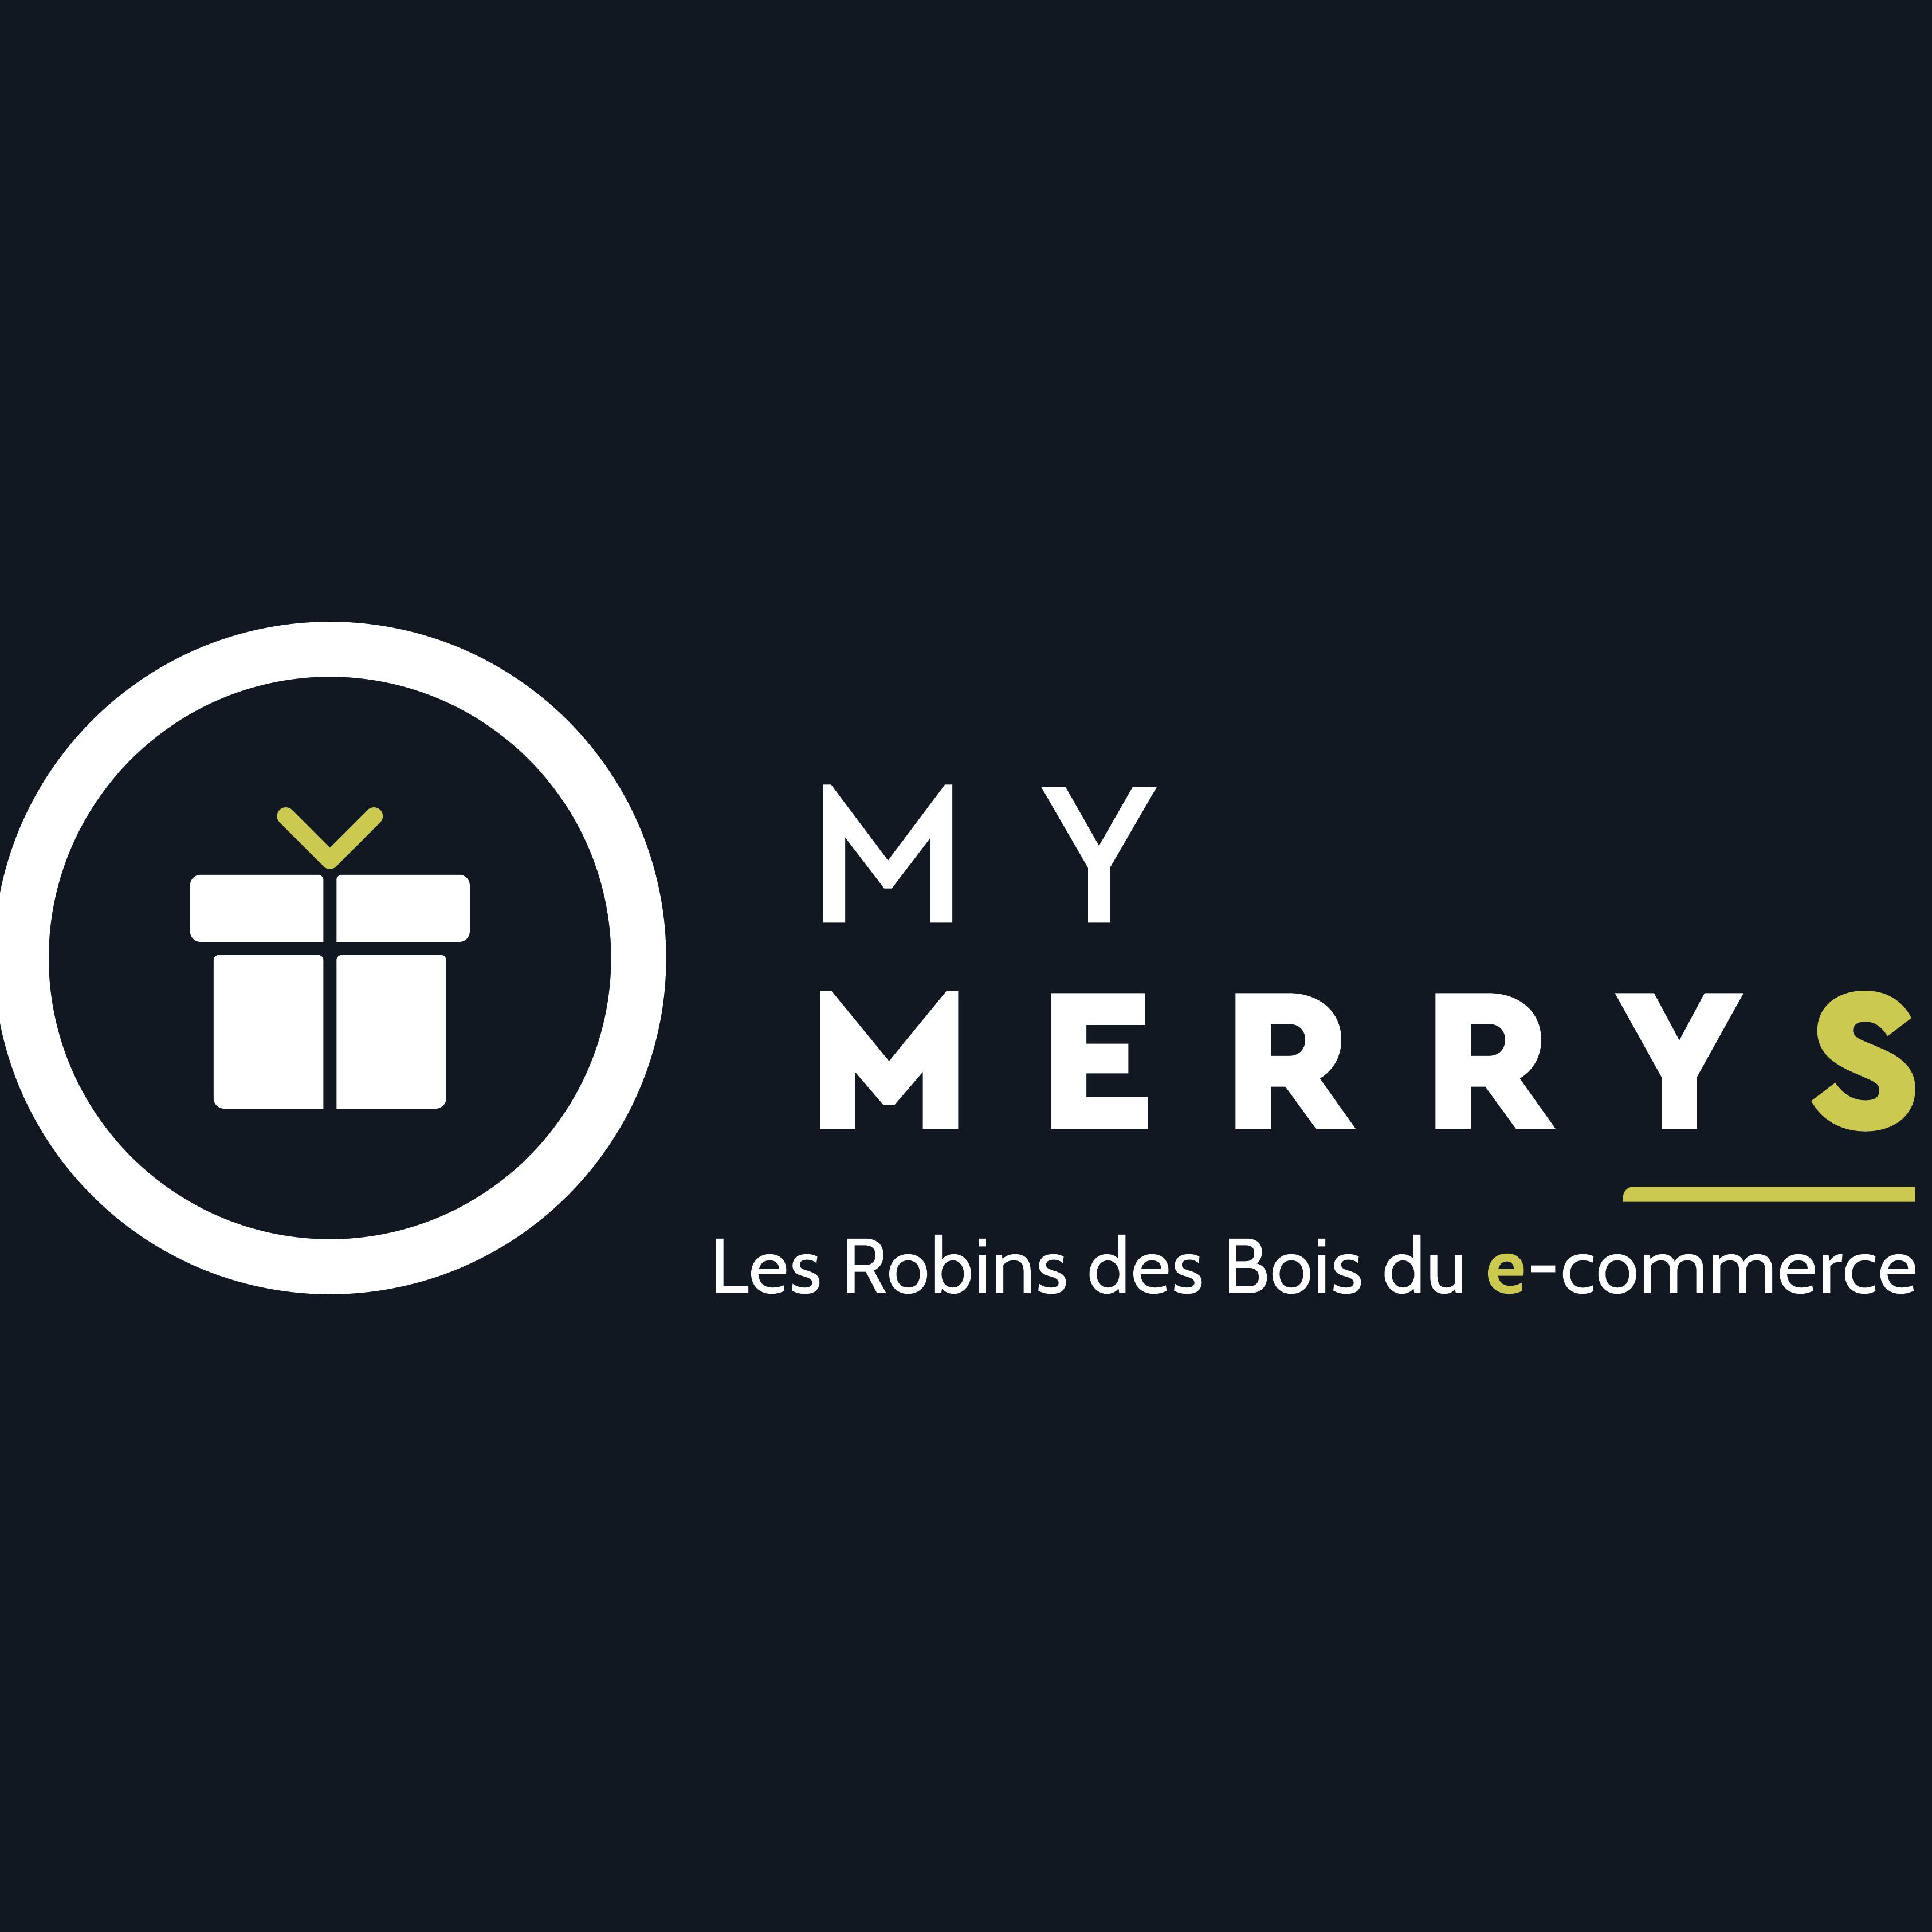 MyMerrys.com